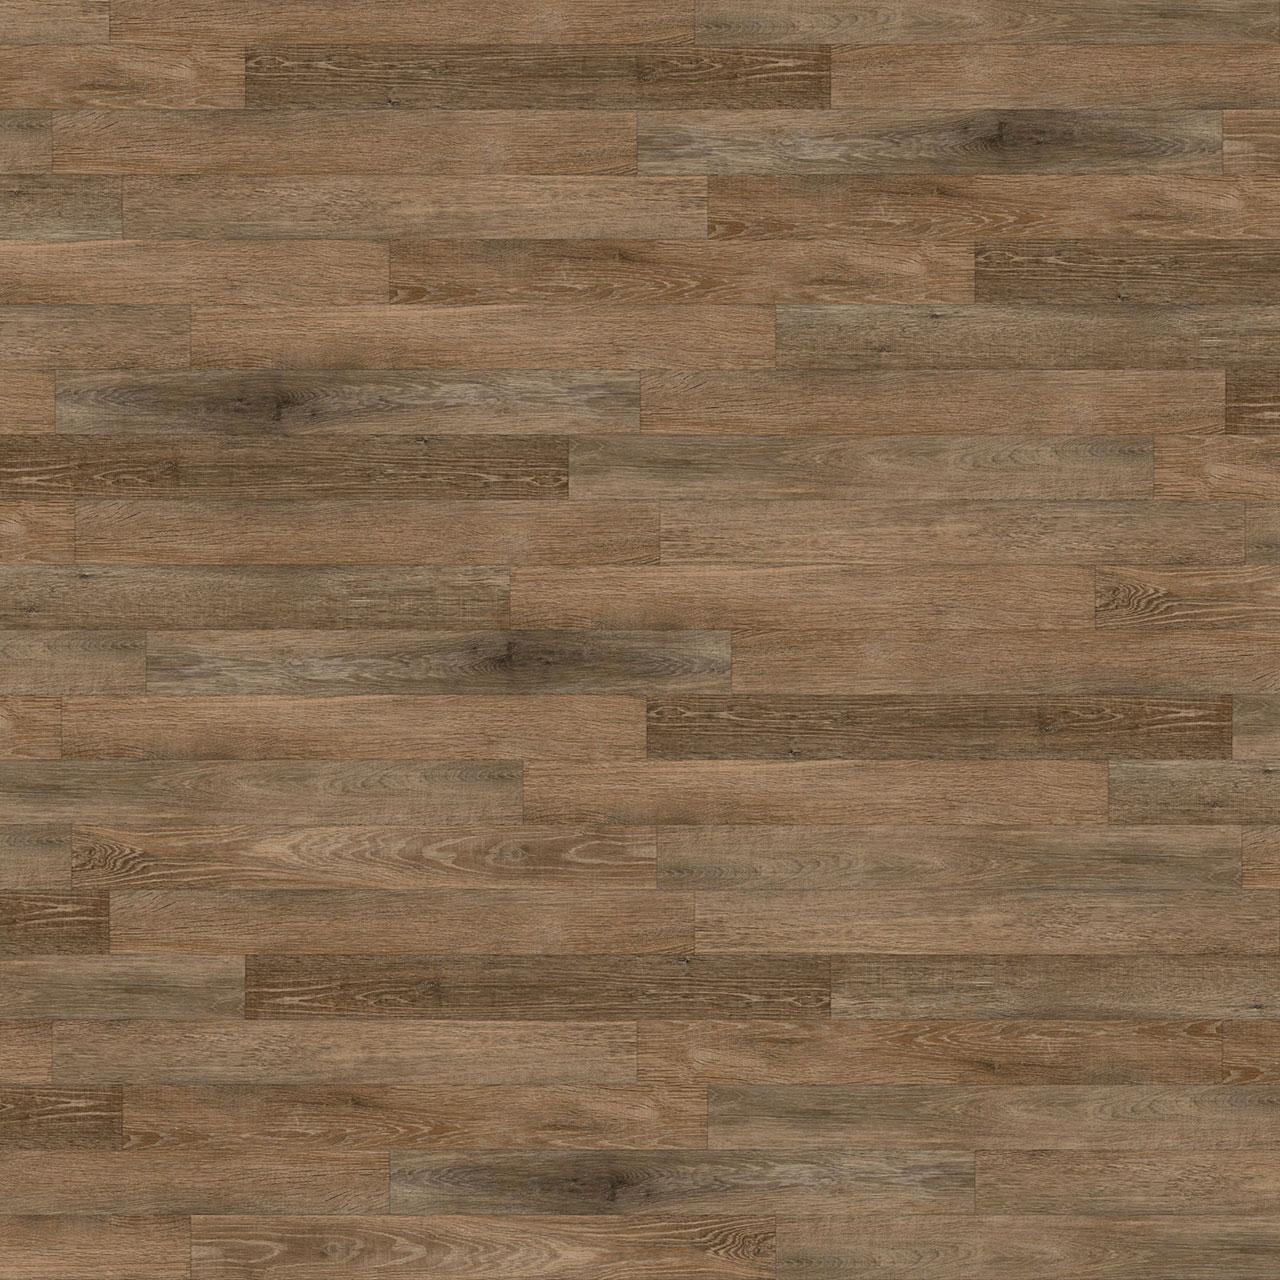 Hampton Home Design Ideas: Noble Oak: Beautifully Designed LVT Wood Flooring From The